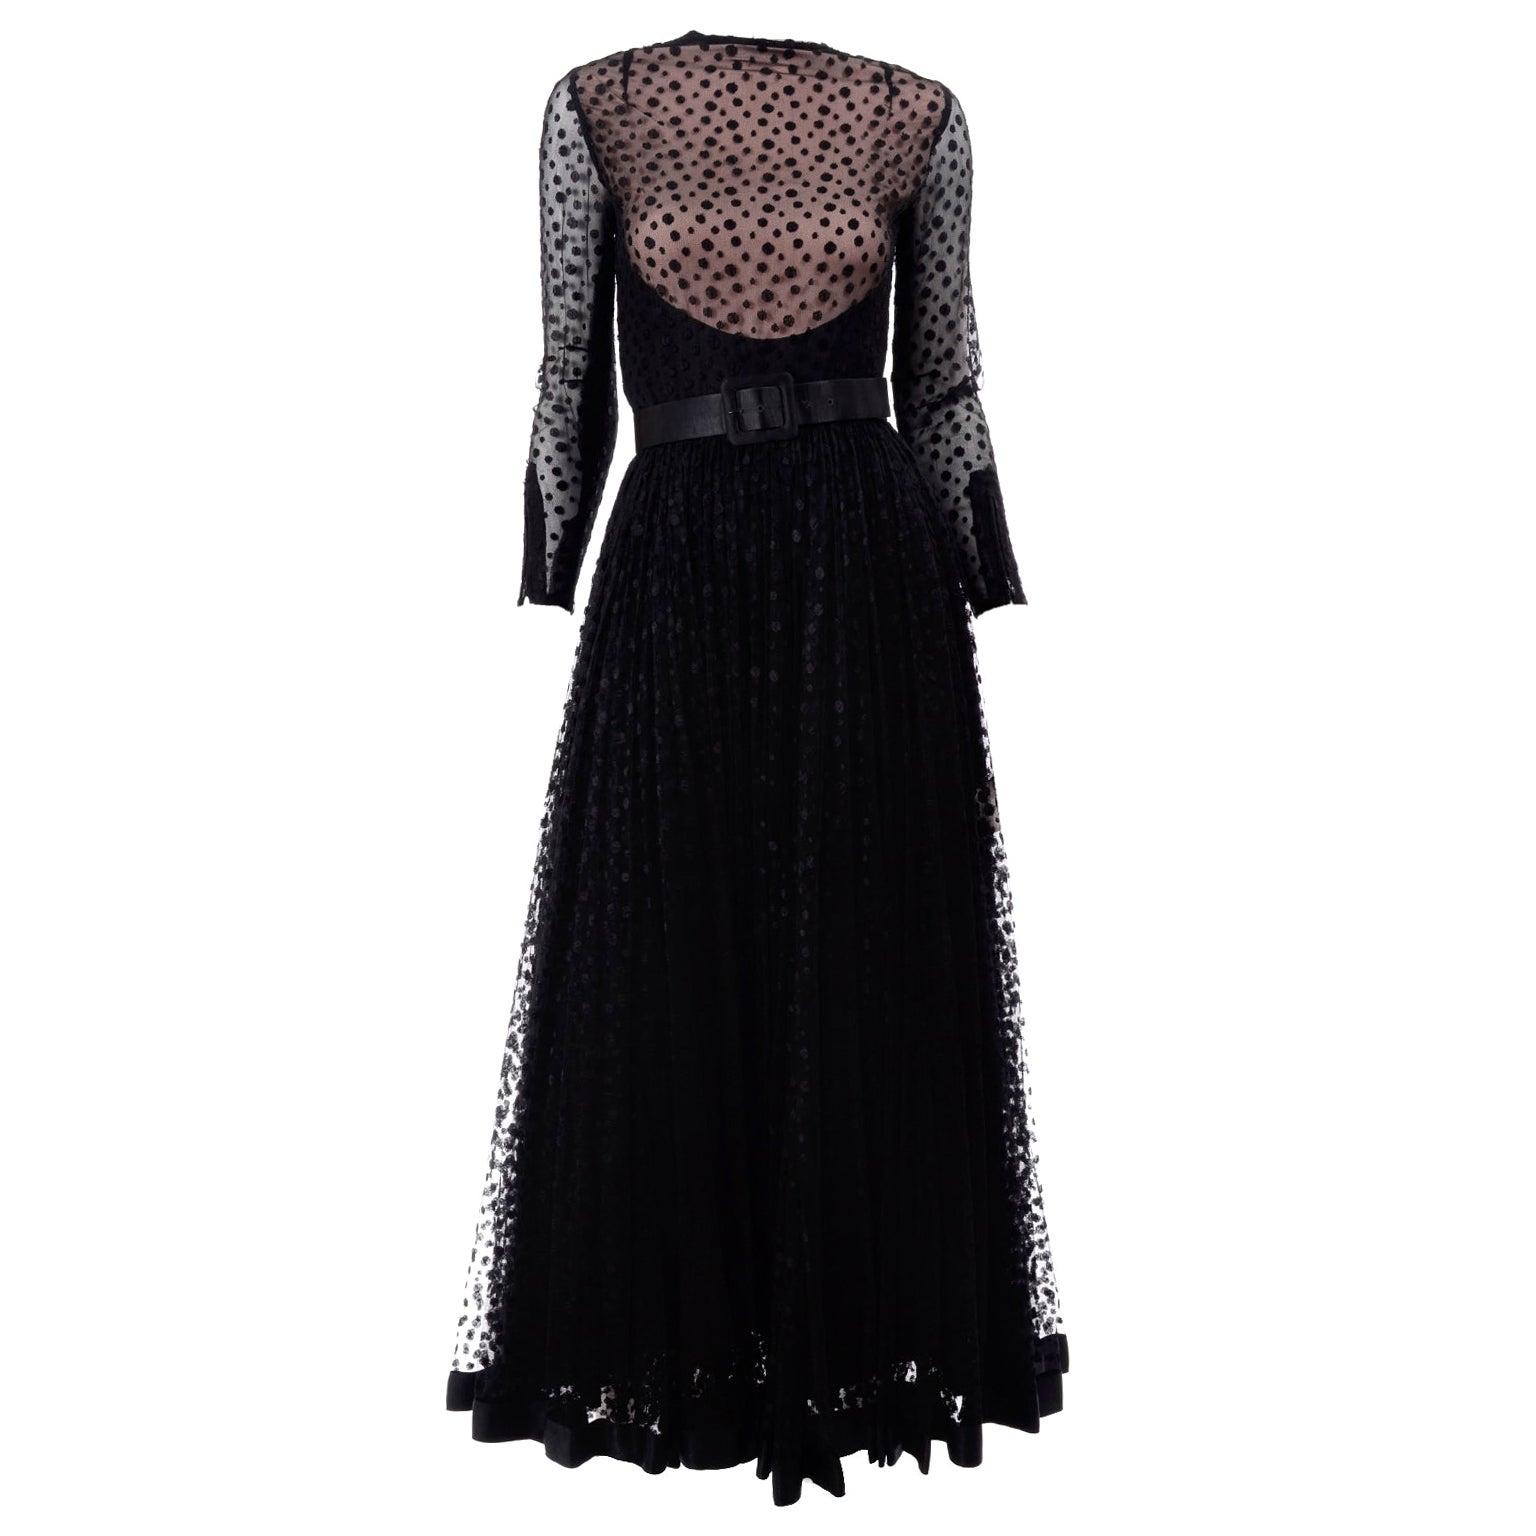 1960s Vintage Bill Blass Illusion Bodice Black Polka Dot Net Evening Dress